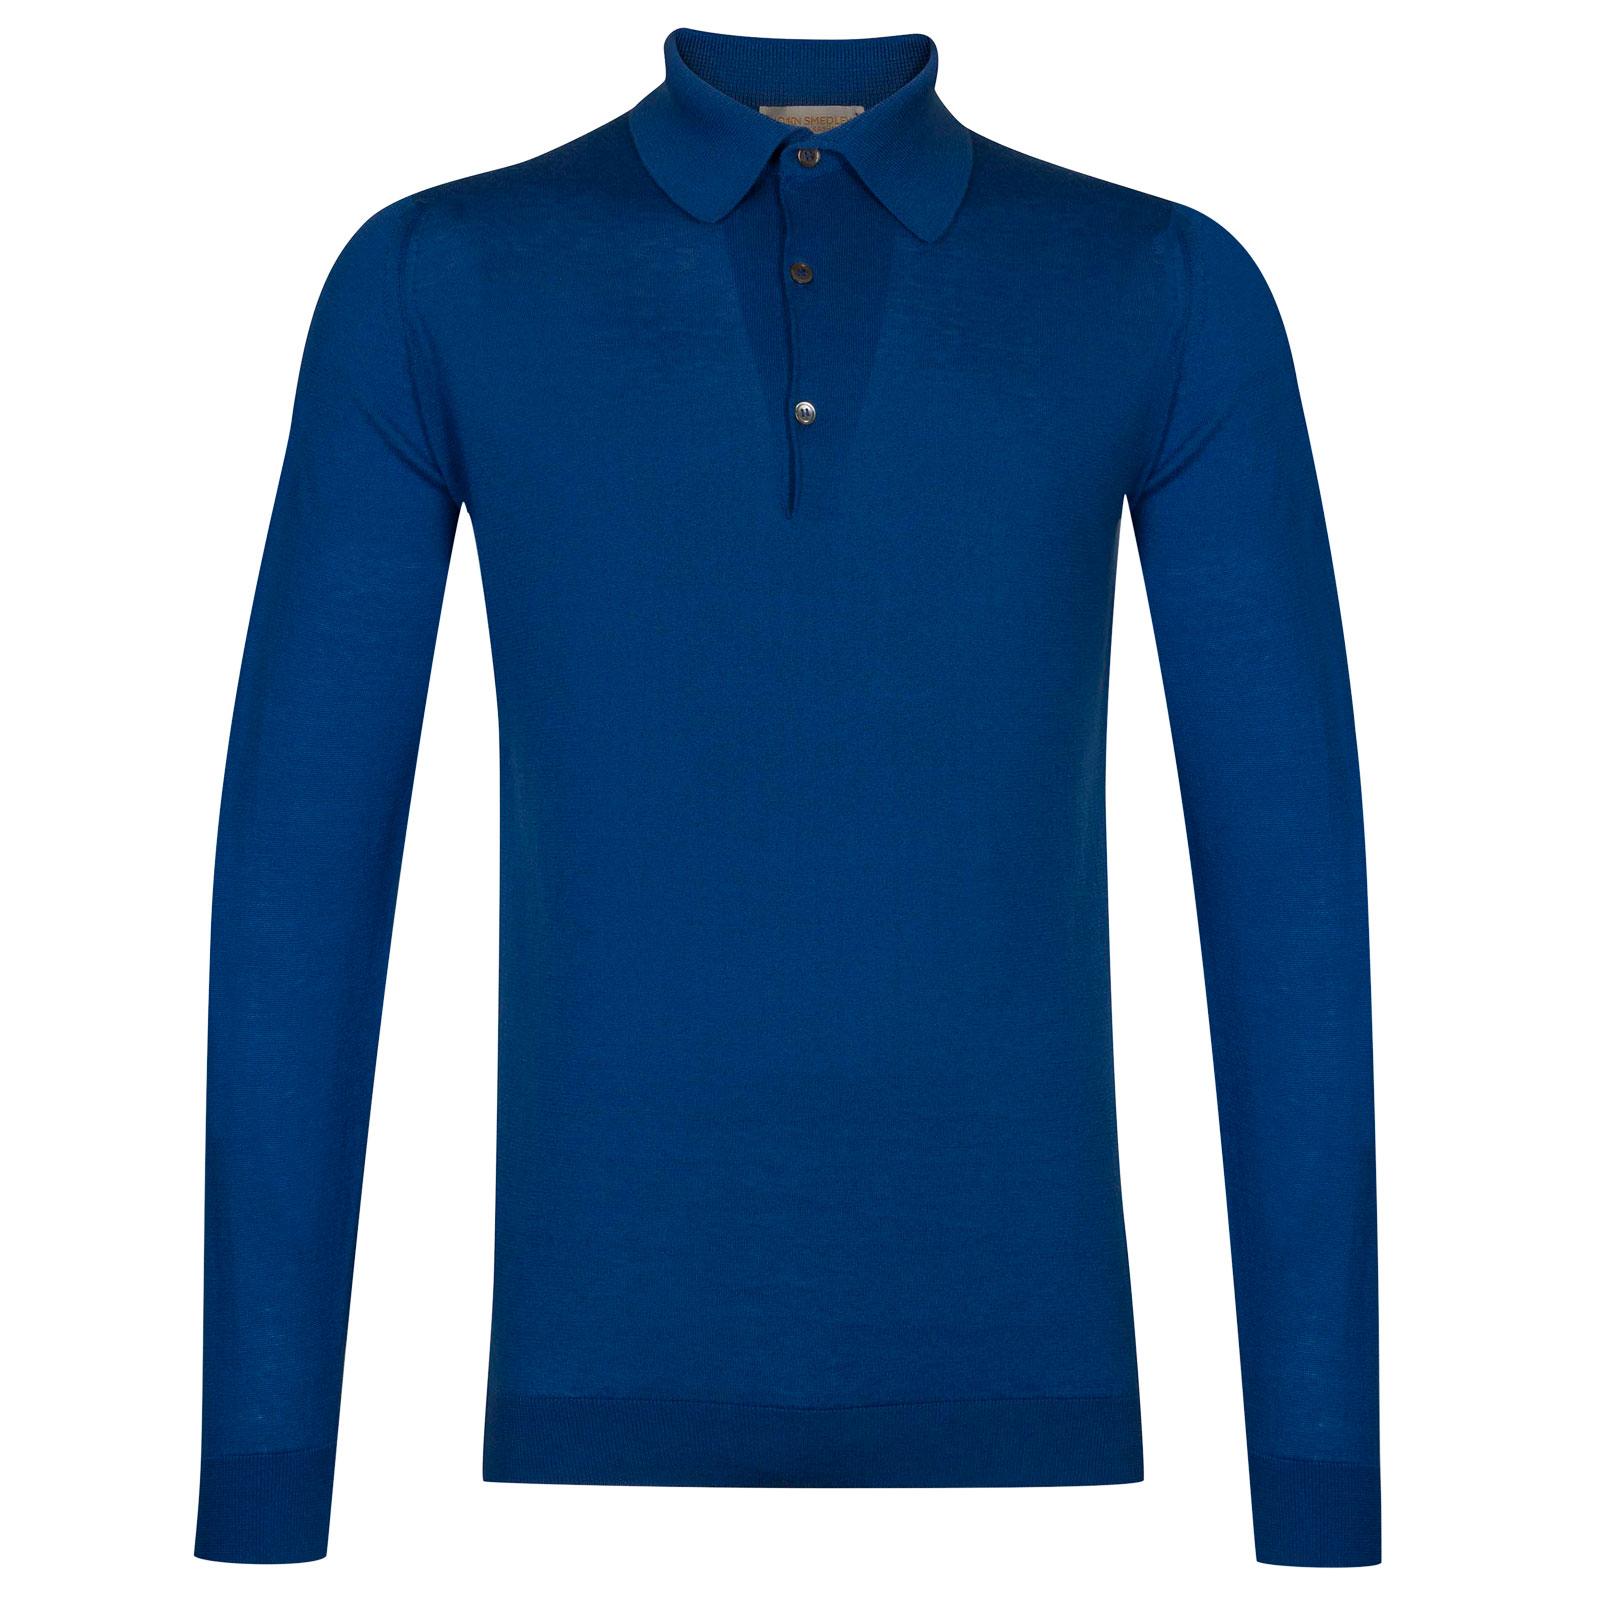 lanlay-Breton-Blue-L